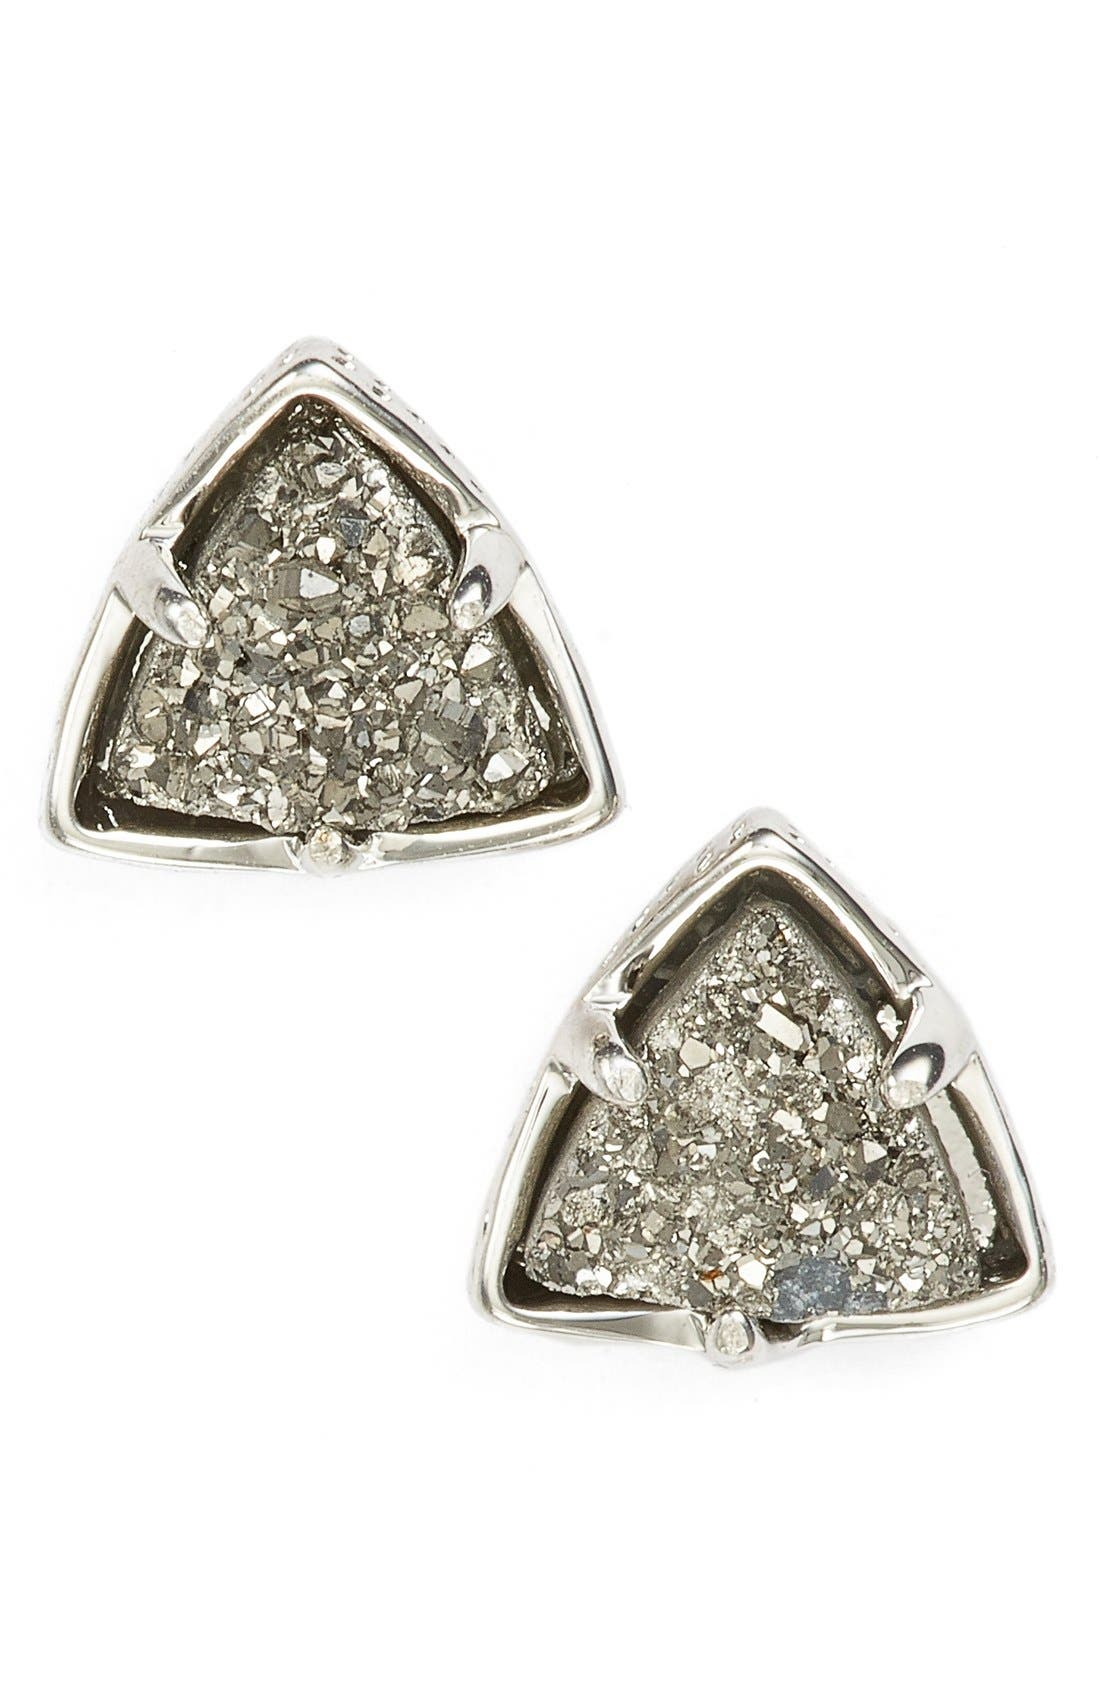 Alternate Image 1 Selected - Kendra Scott 'Parker' Drusy Stud Earrings